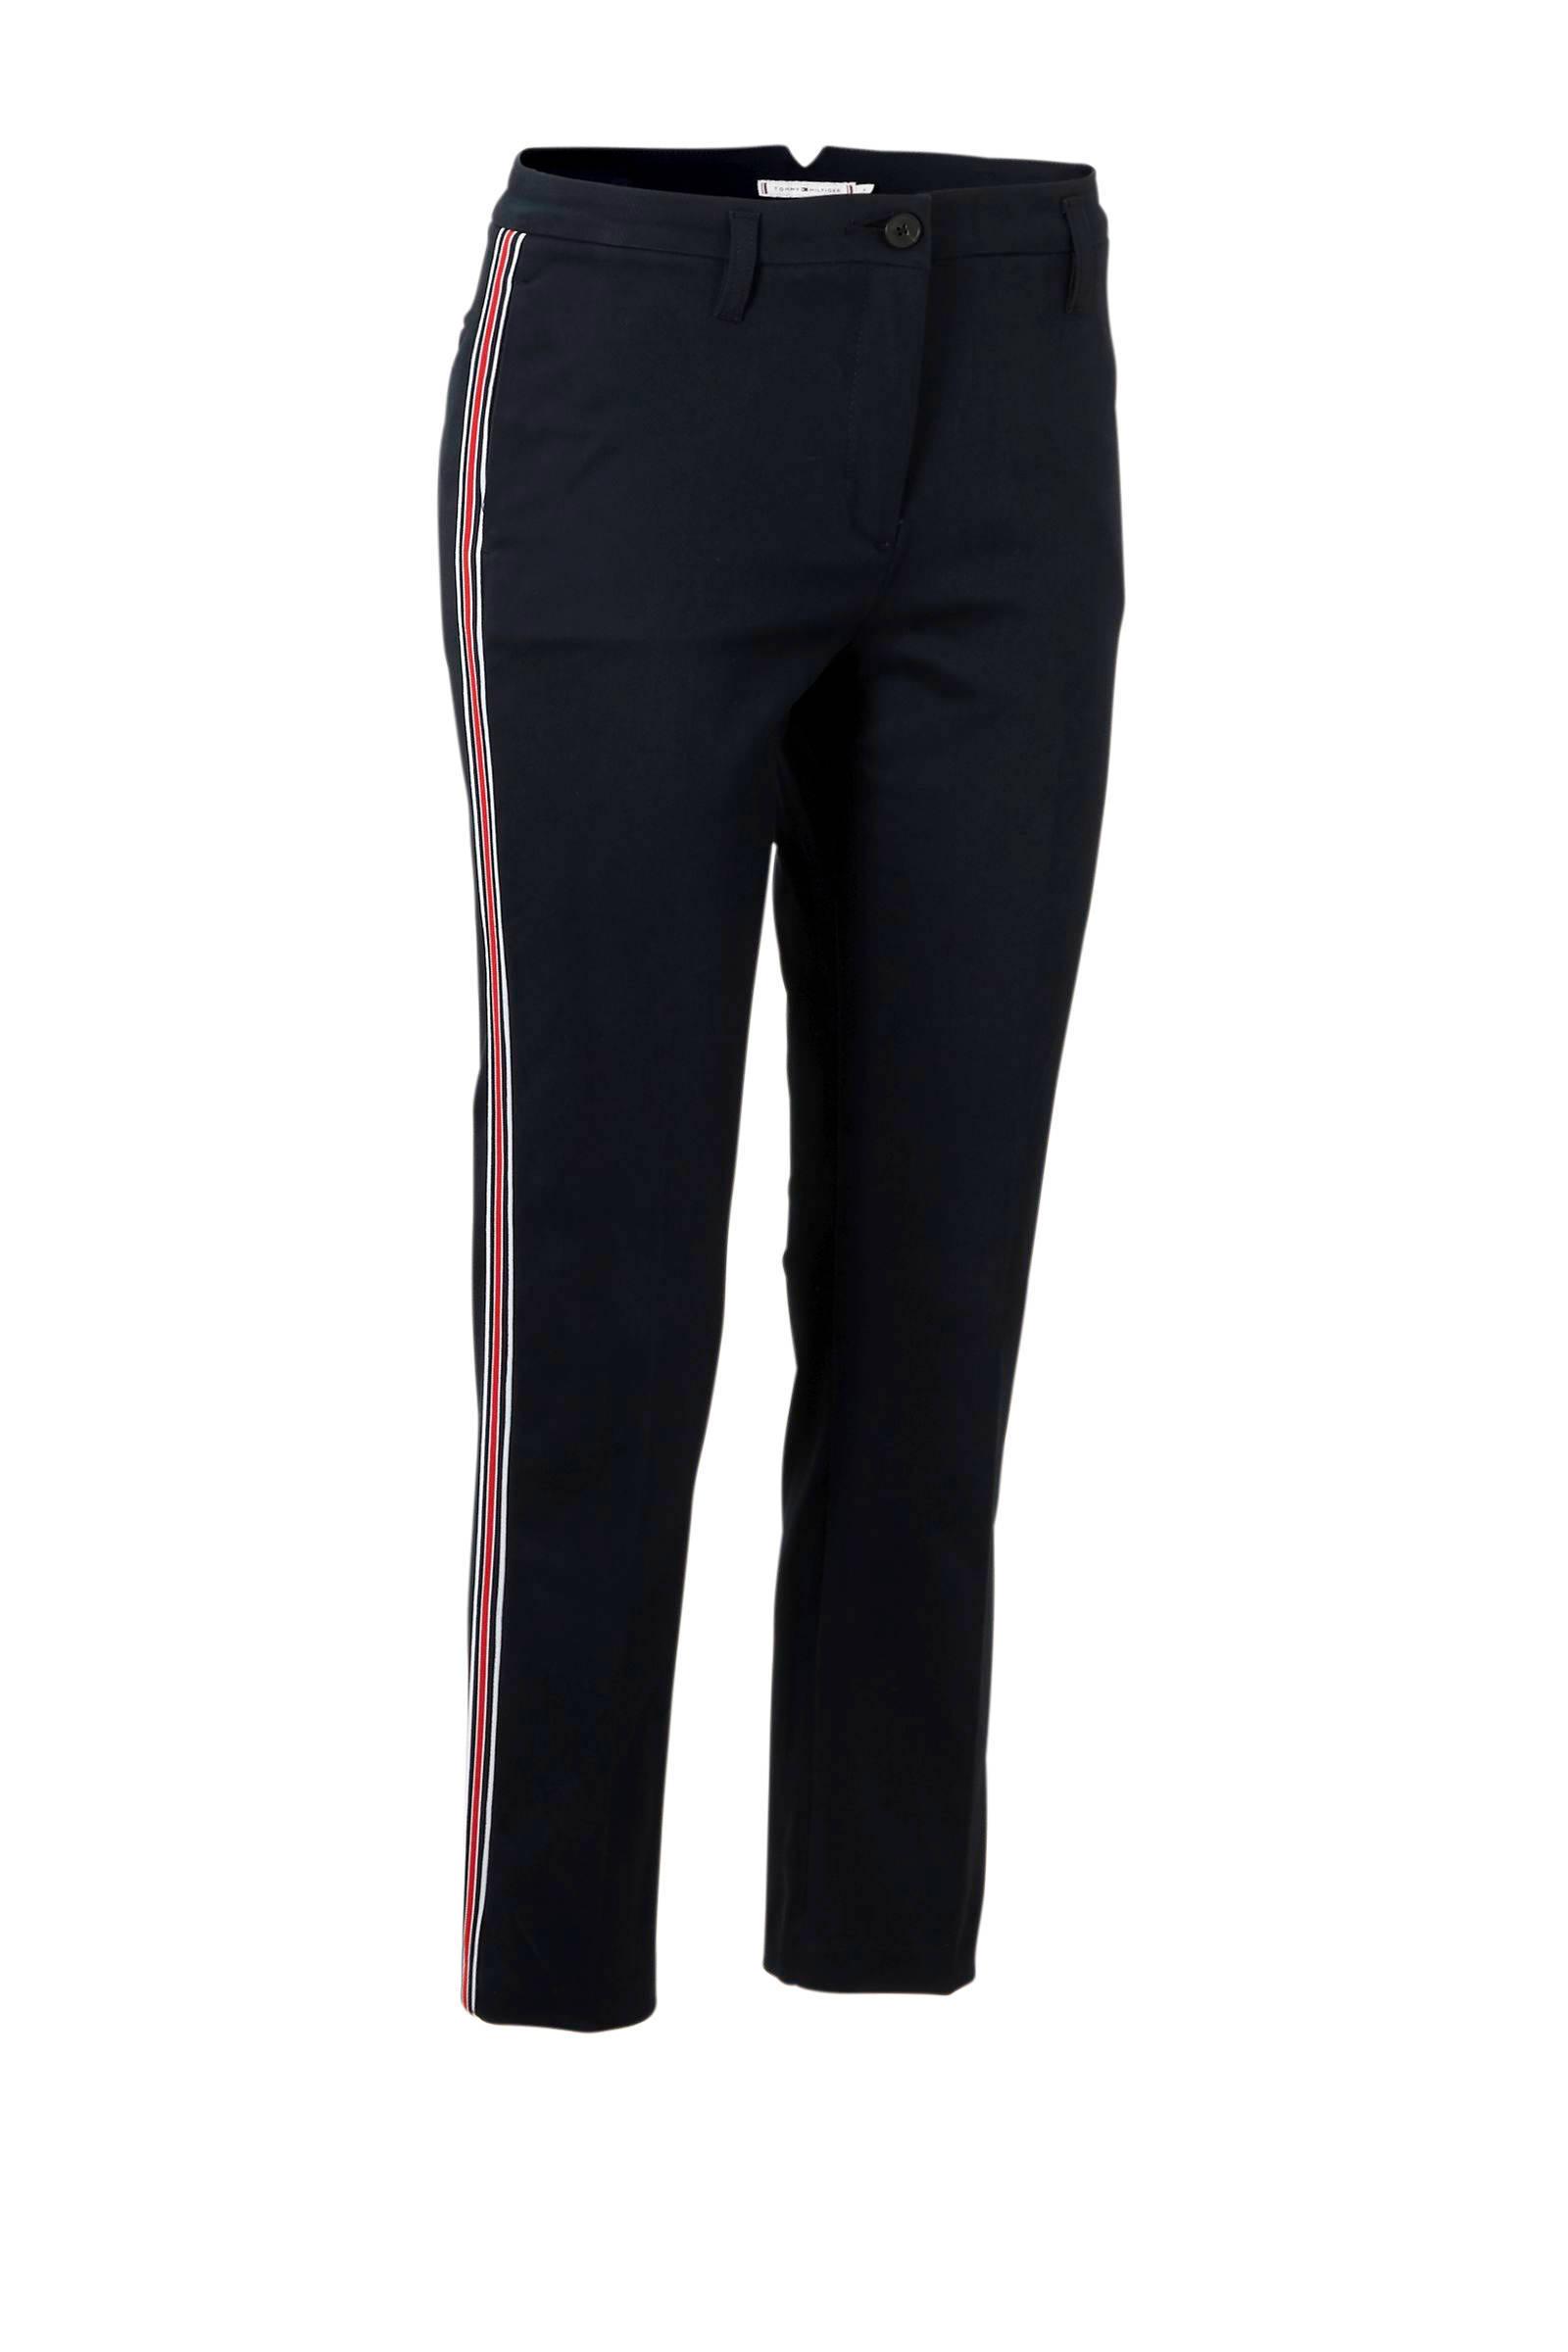 69618fbf53f121 Tommy Hilfiger dameskleding bij wehkamp - Gratis bezorging vanaf 20.-